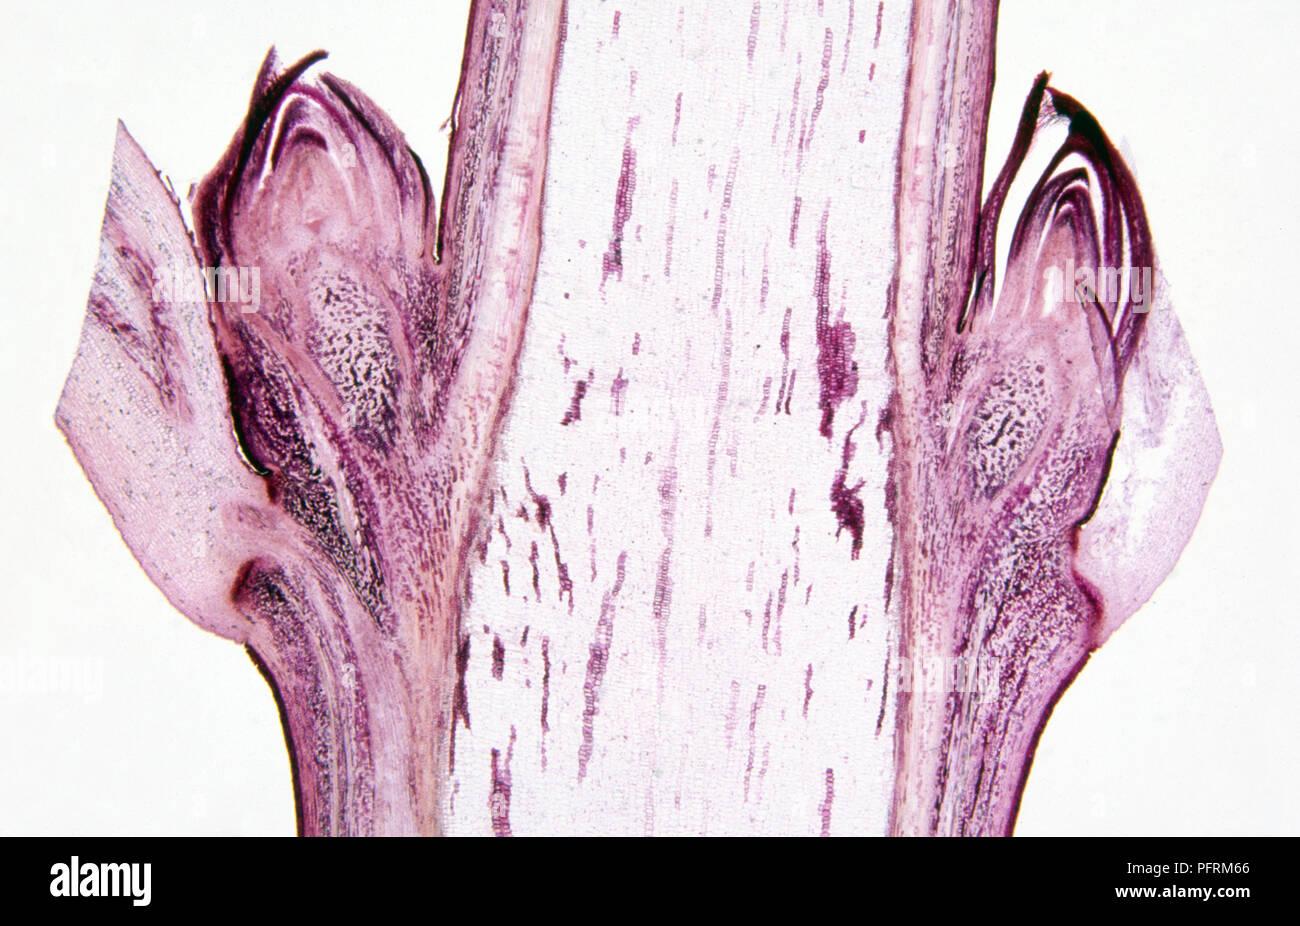 Micrograph, longitudinal section through woody dicotyledonous stem - Stock Image